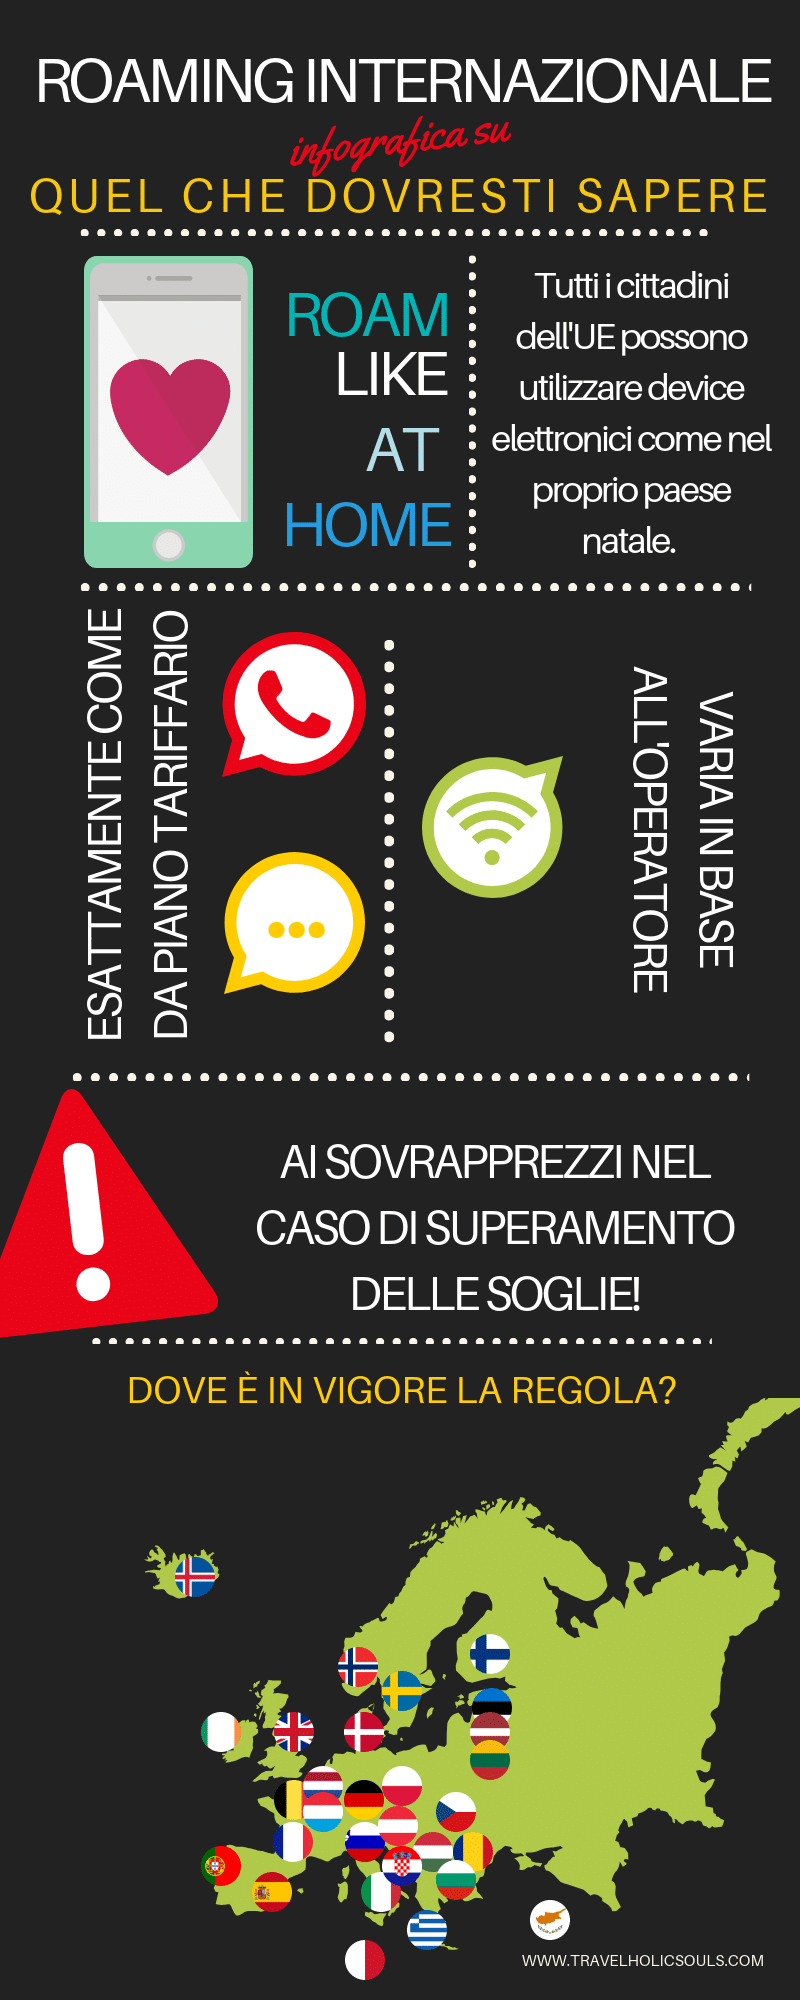 roaming internazionale infografica